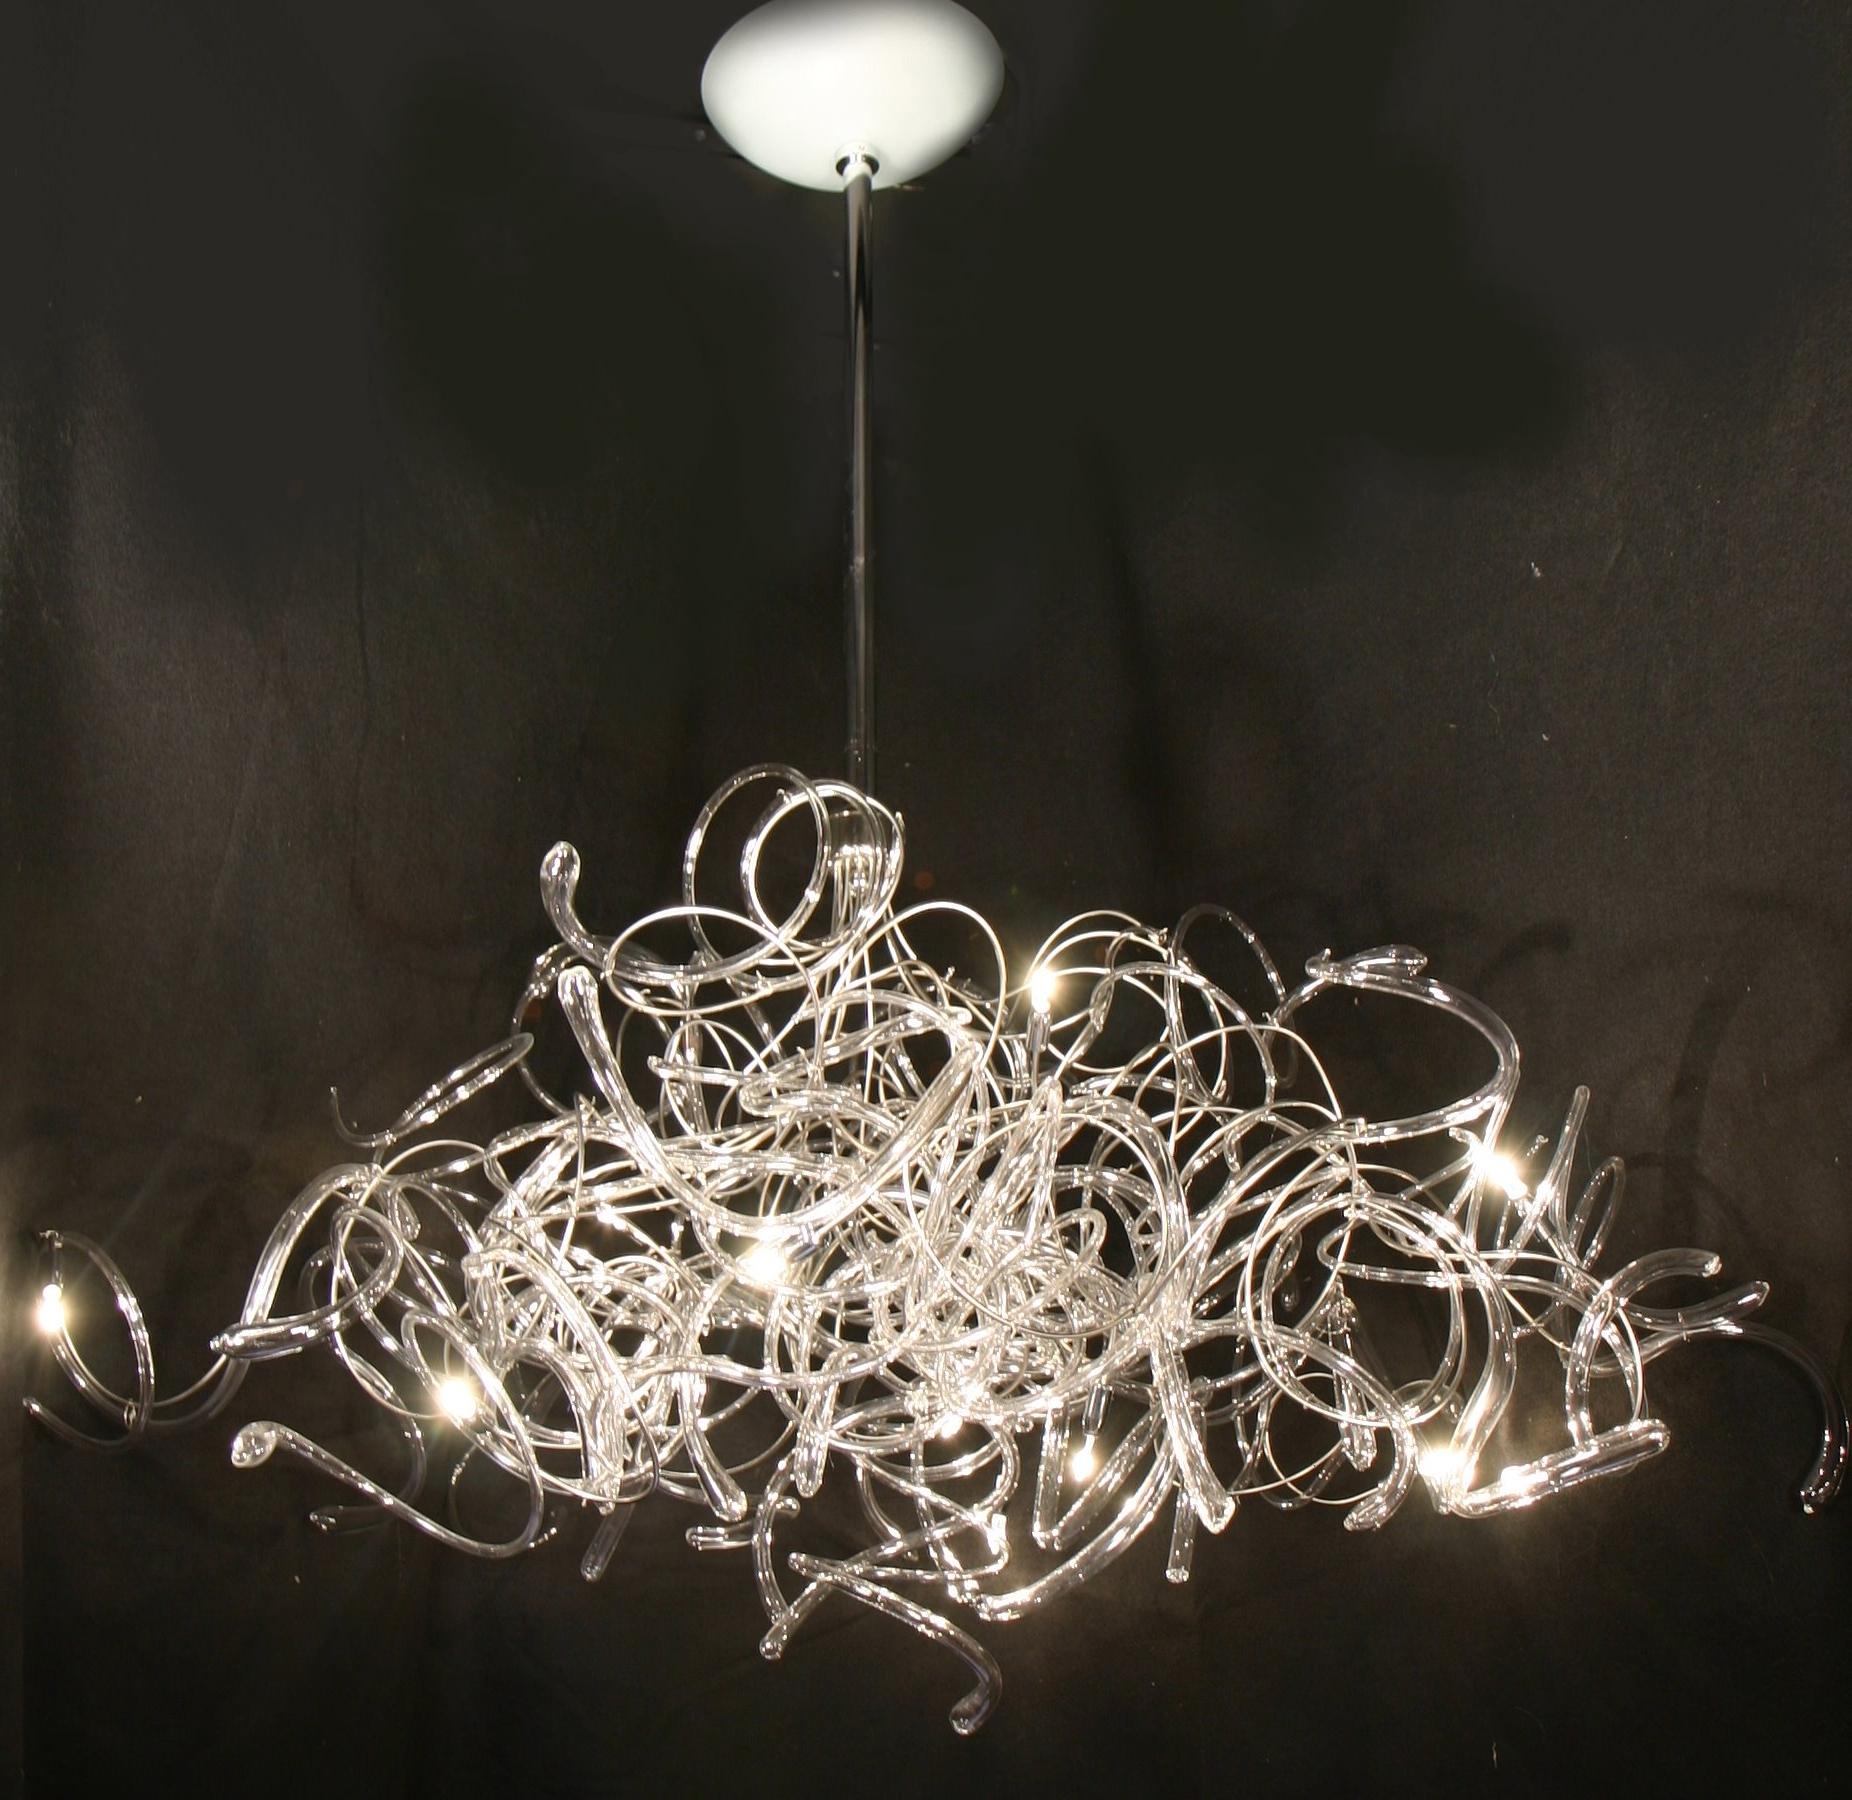 Fashionable Ultra Modern Chandeliers – Chandelier Designs With Regard To Modern Light Chandelier (View 6 of 15)